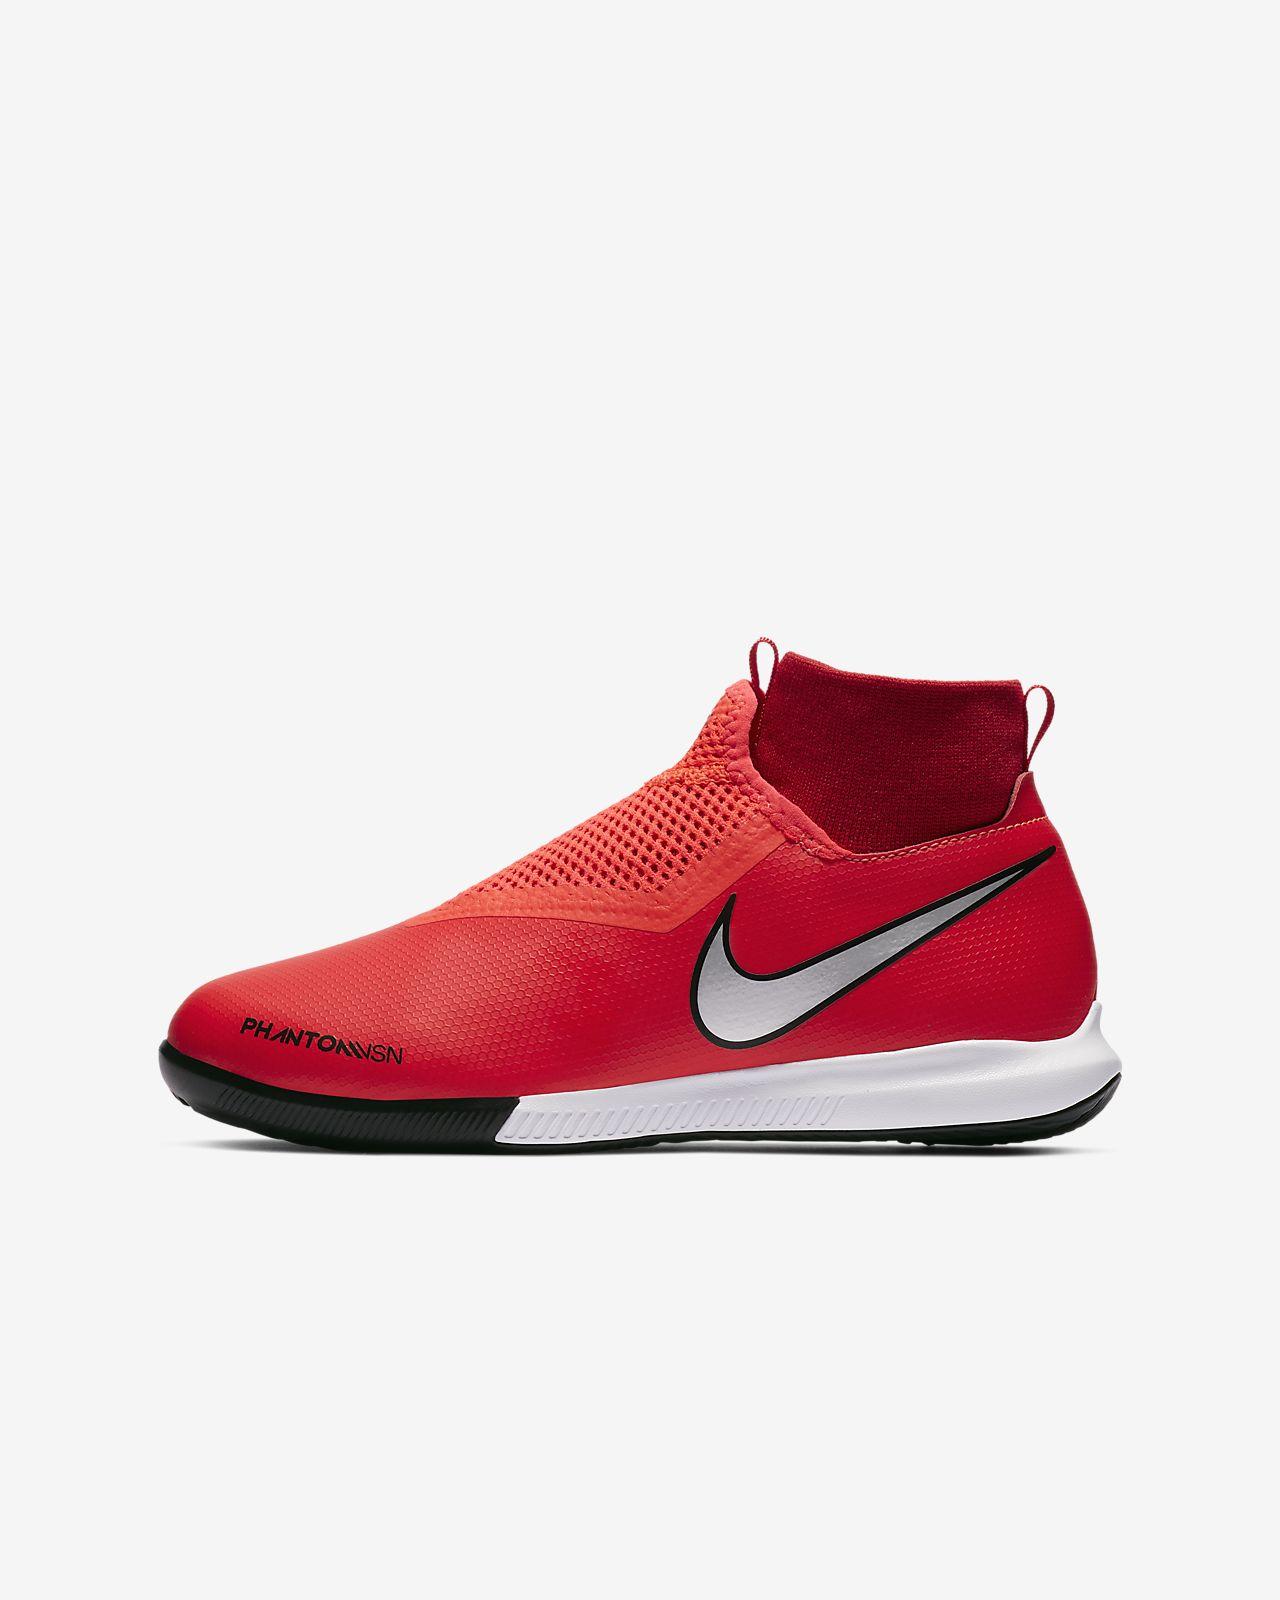 b20dc1d8455d5 ... Nike Jr. Phantom Vision Academy Dynamic Fit IC Botas de fútbol sala -  Niño